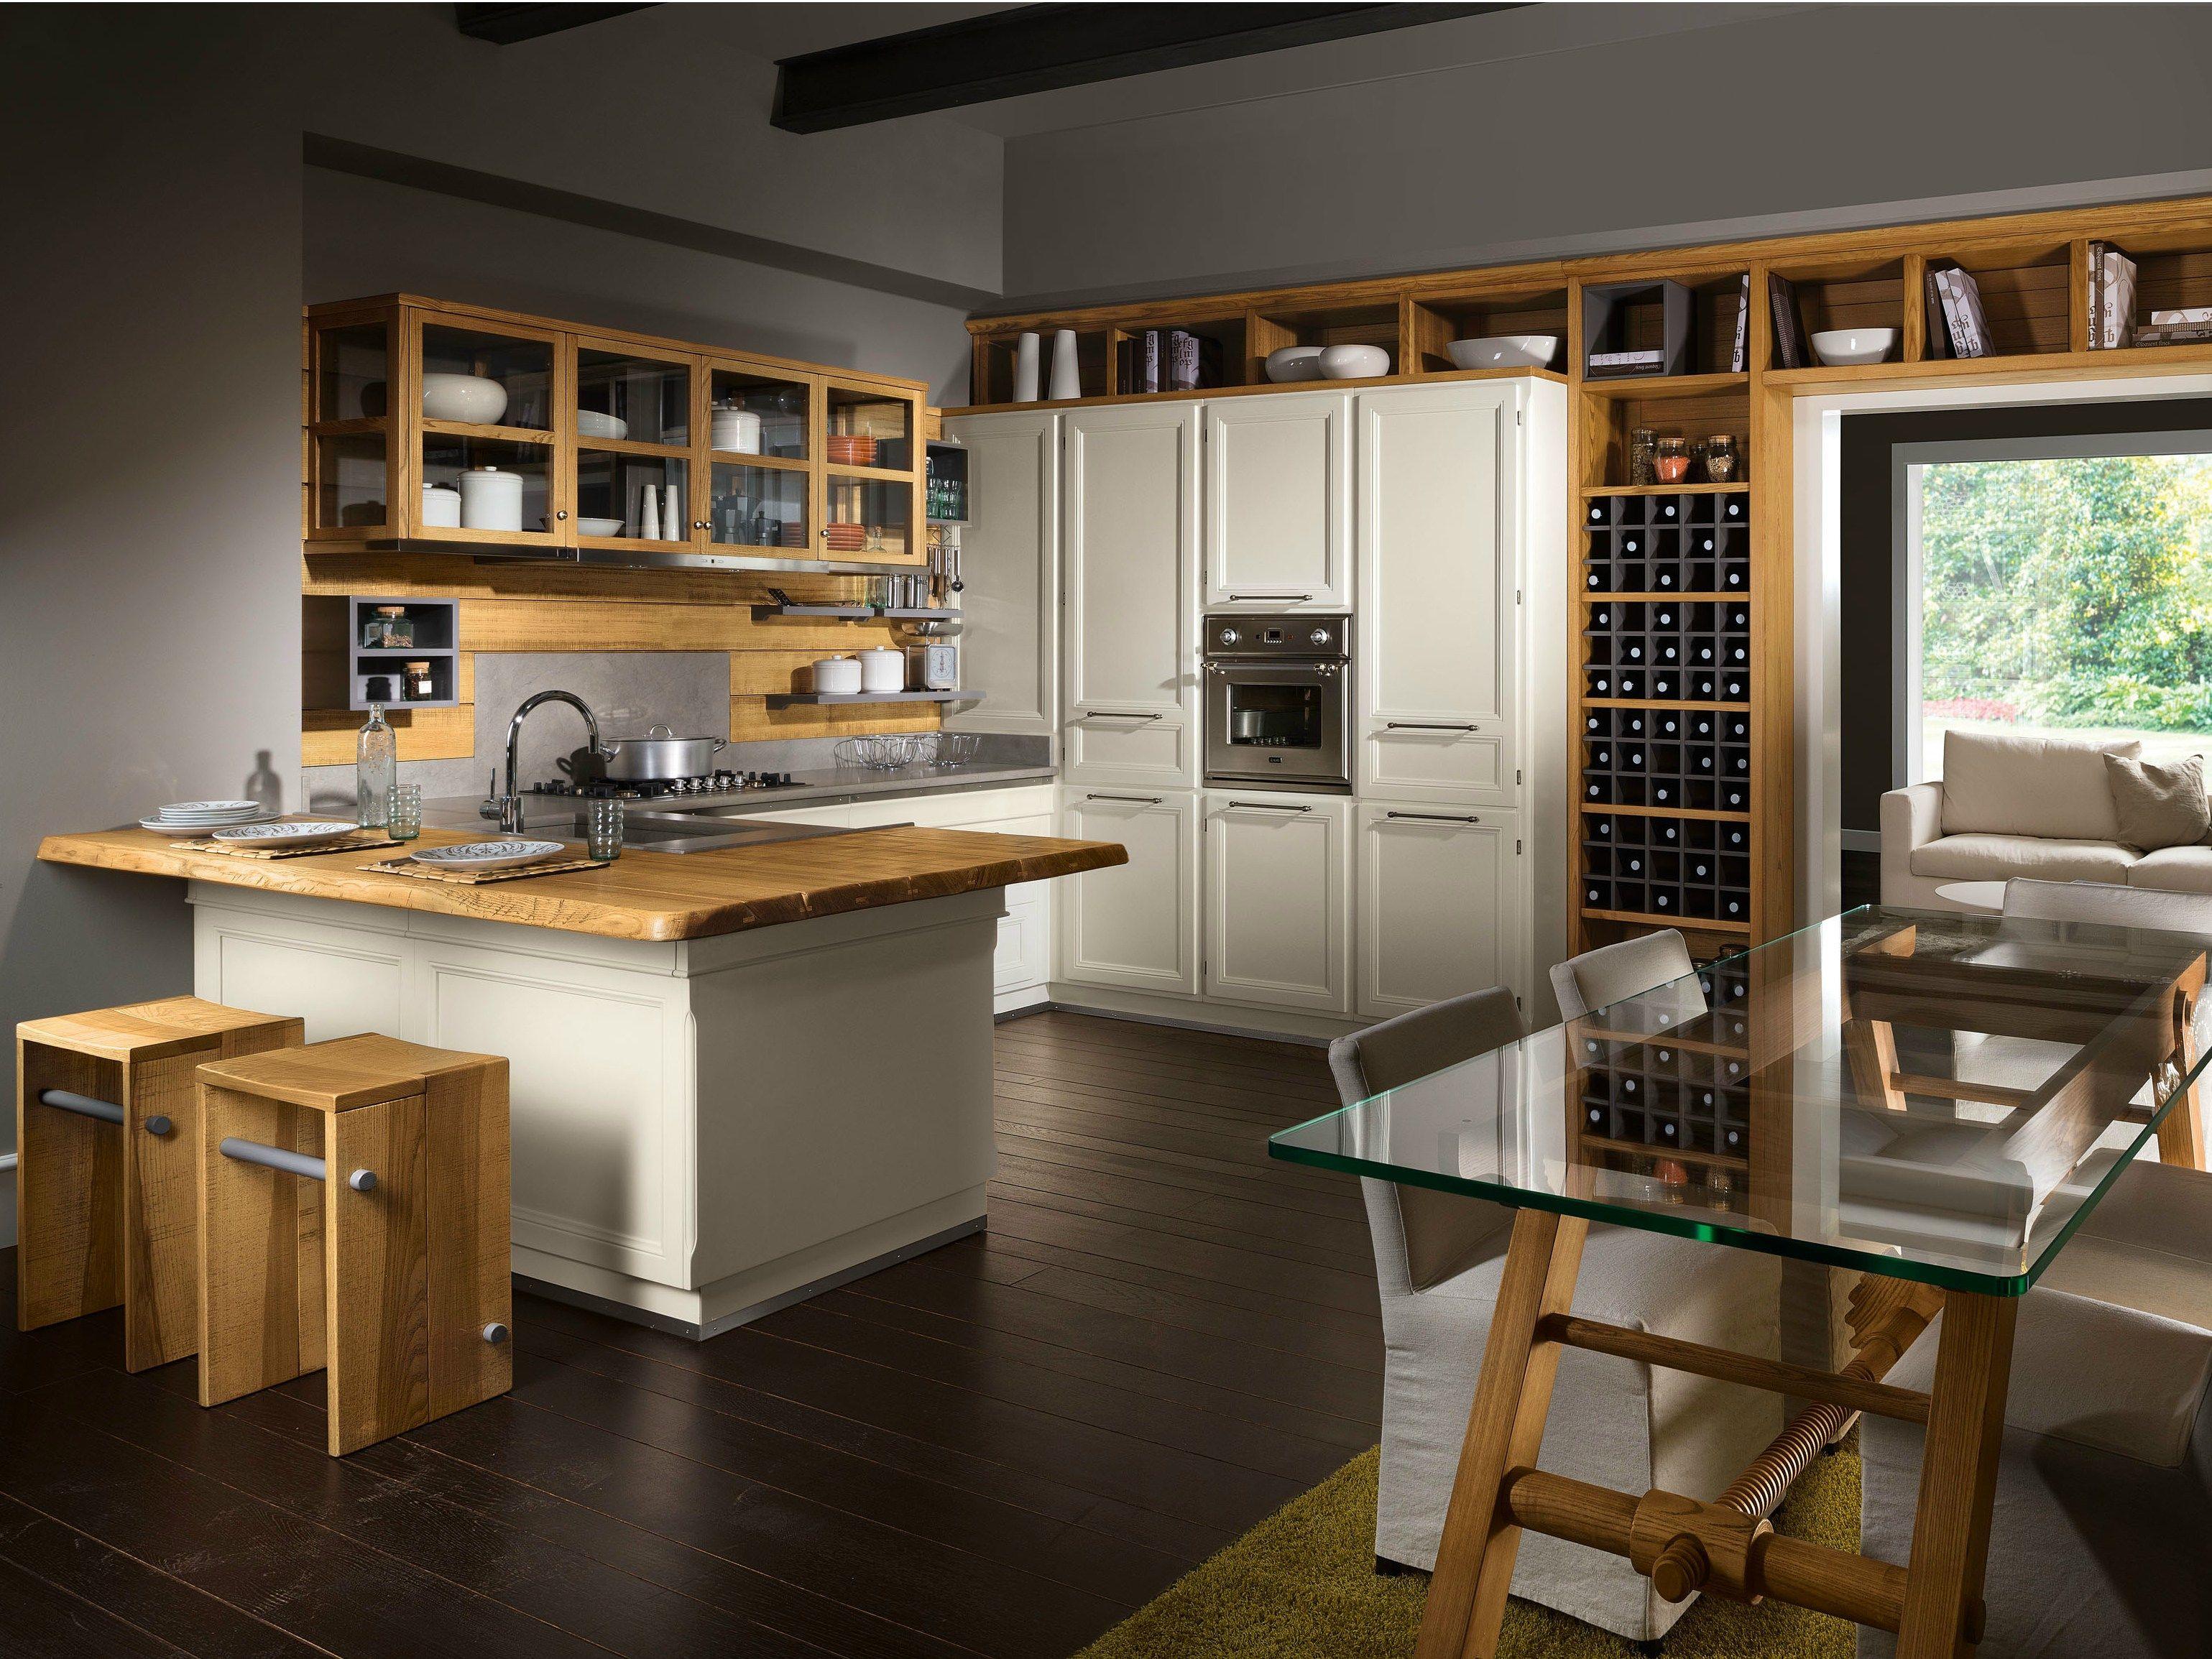 Cocina integral con península LIVING VERANDA by L\'Ottocento | Loft ...